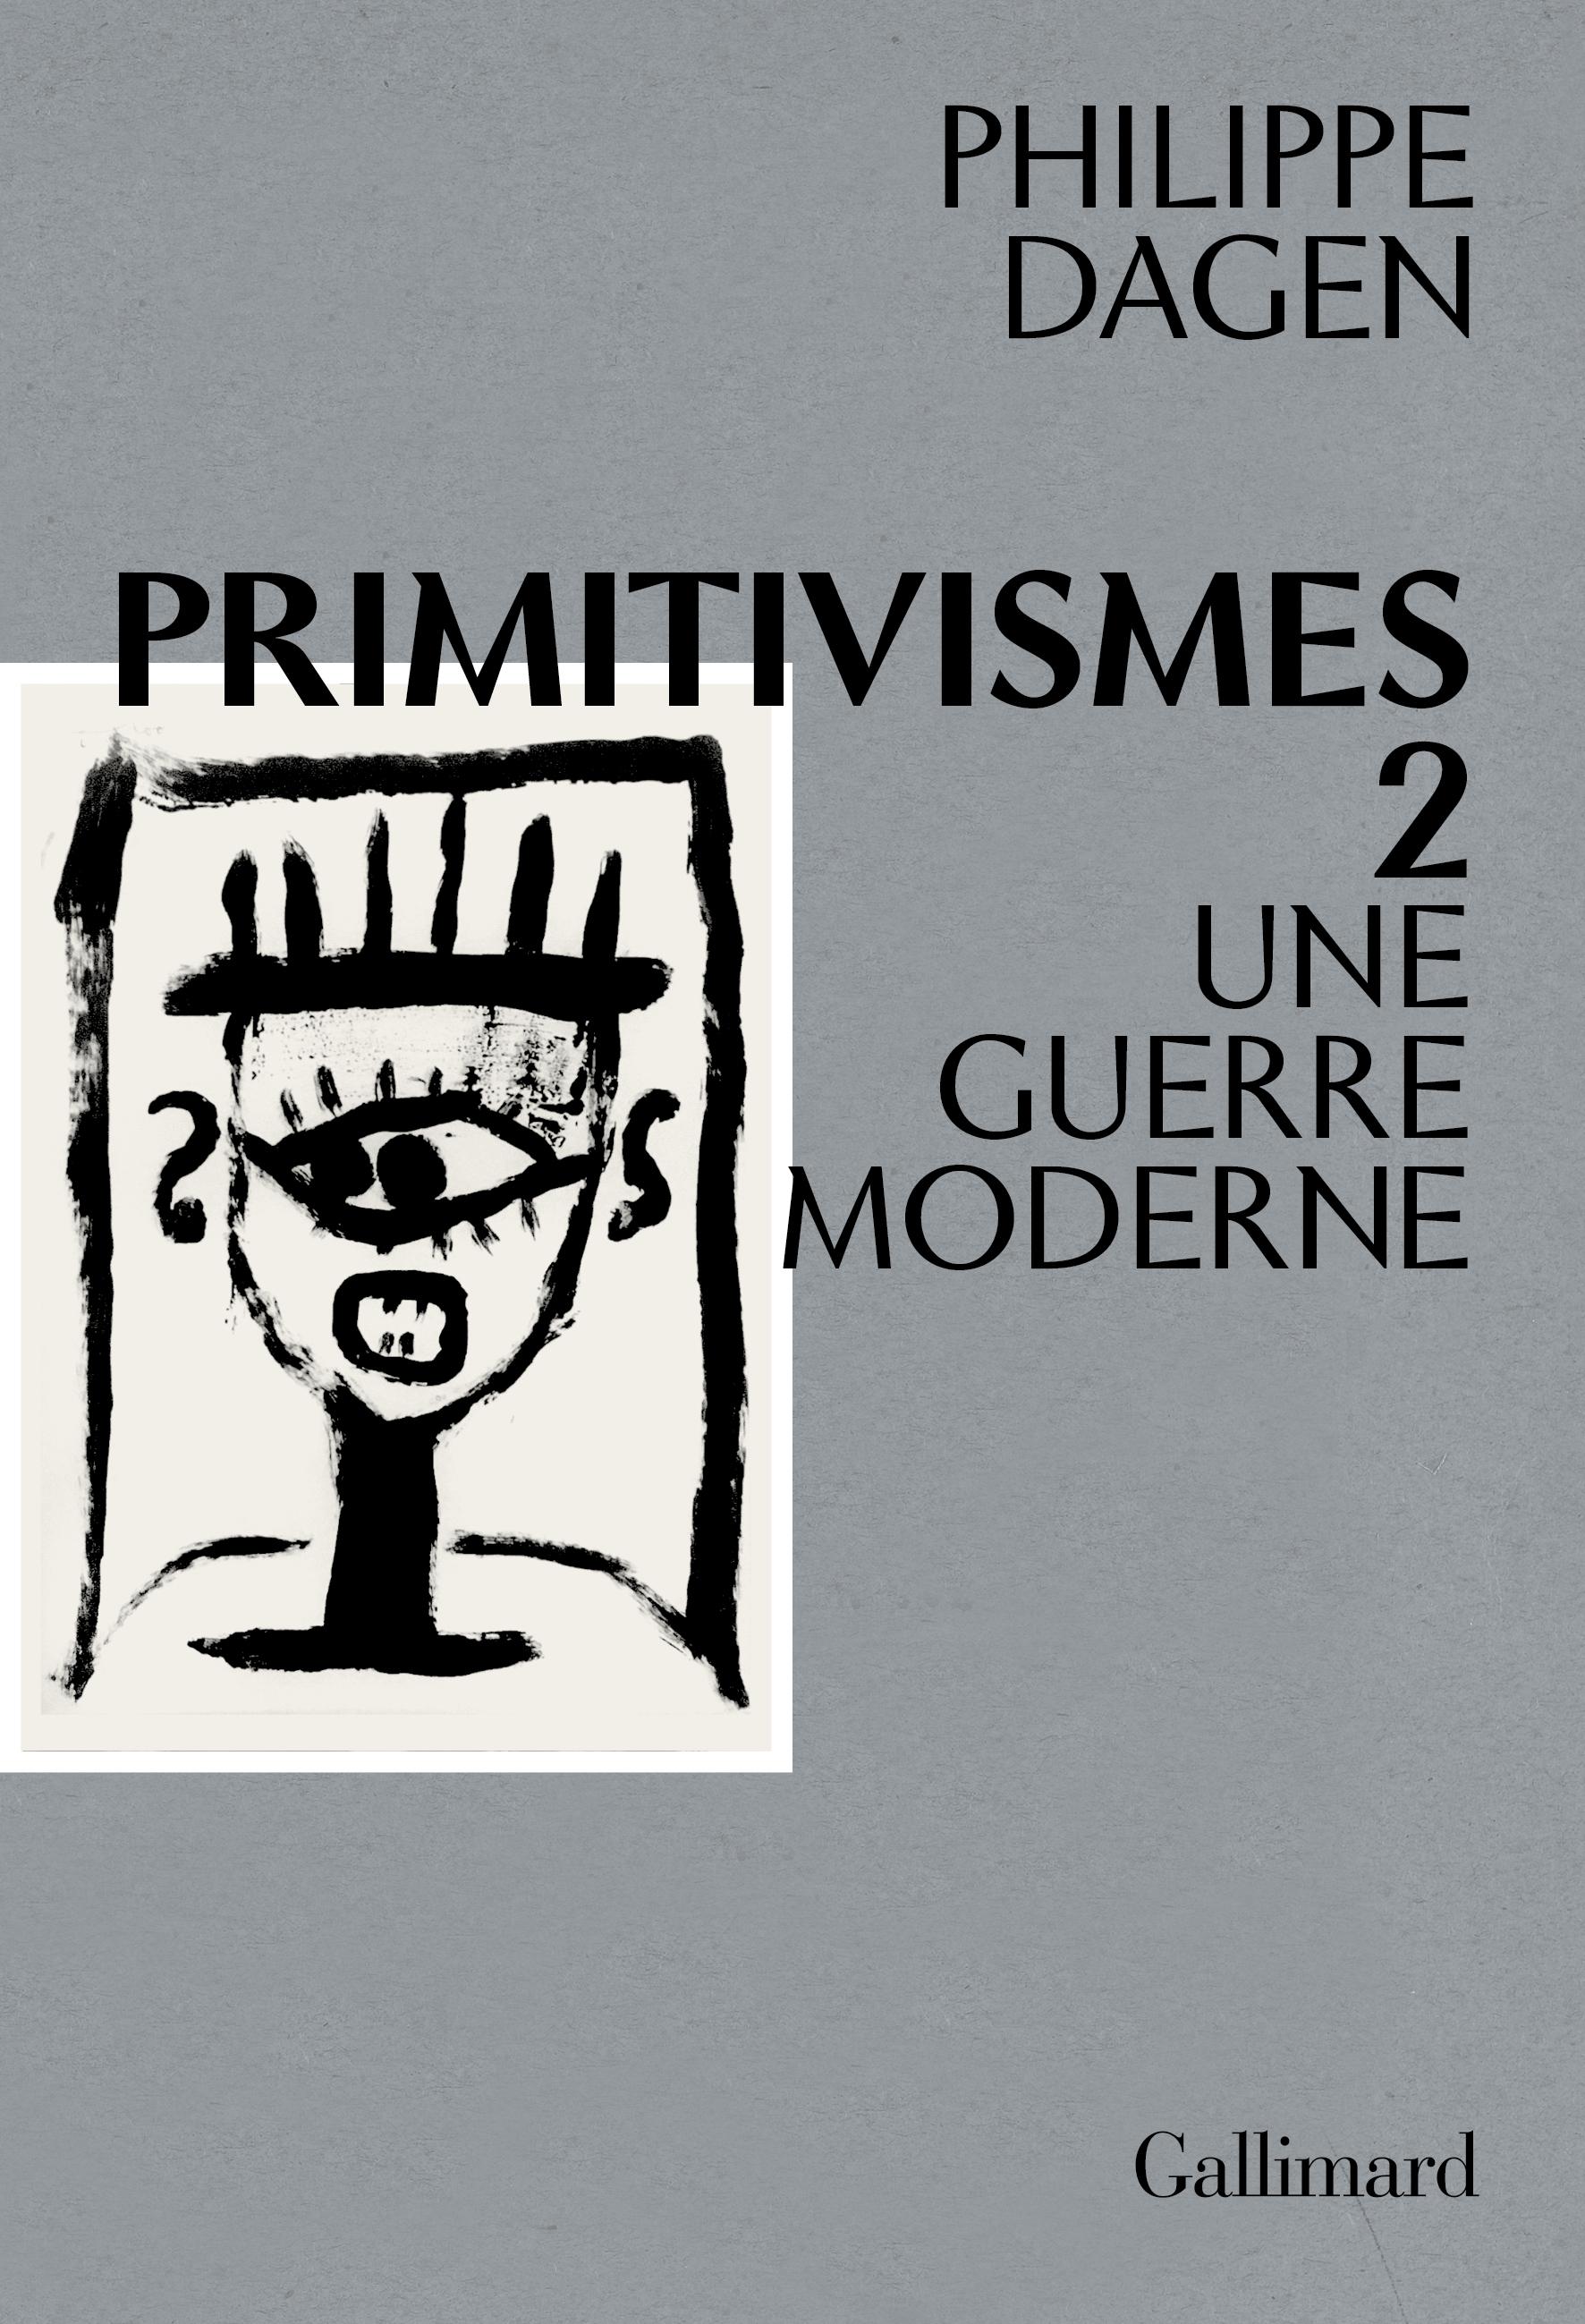 Ph. Dagen, Primitivisme II. Une guerre moderne